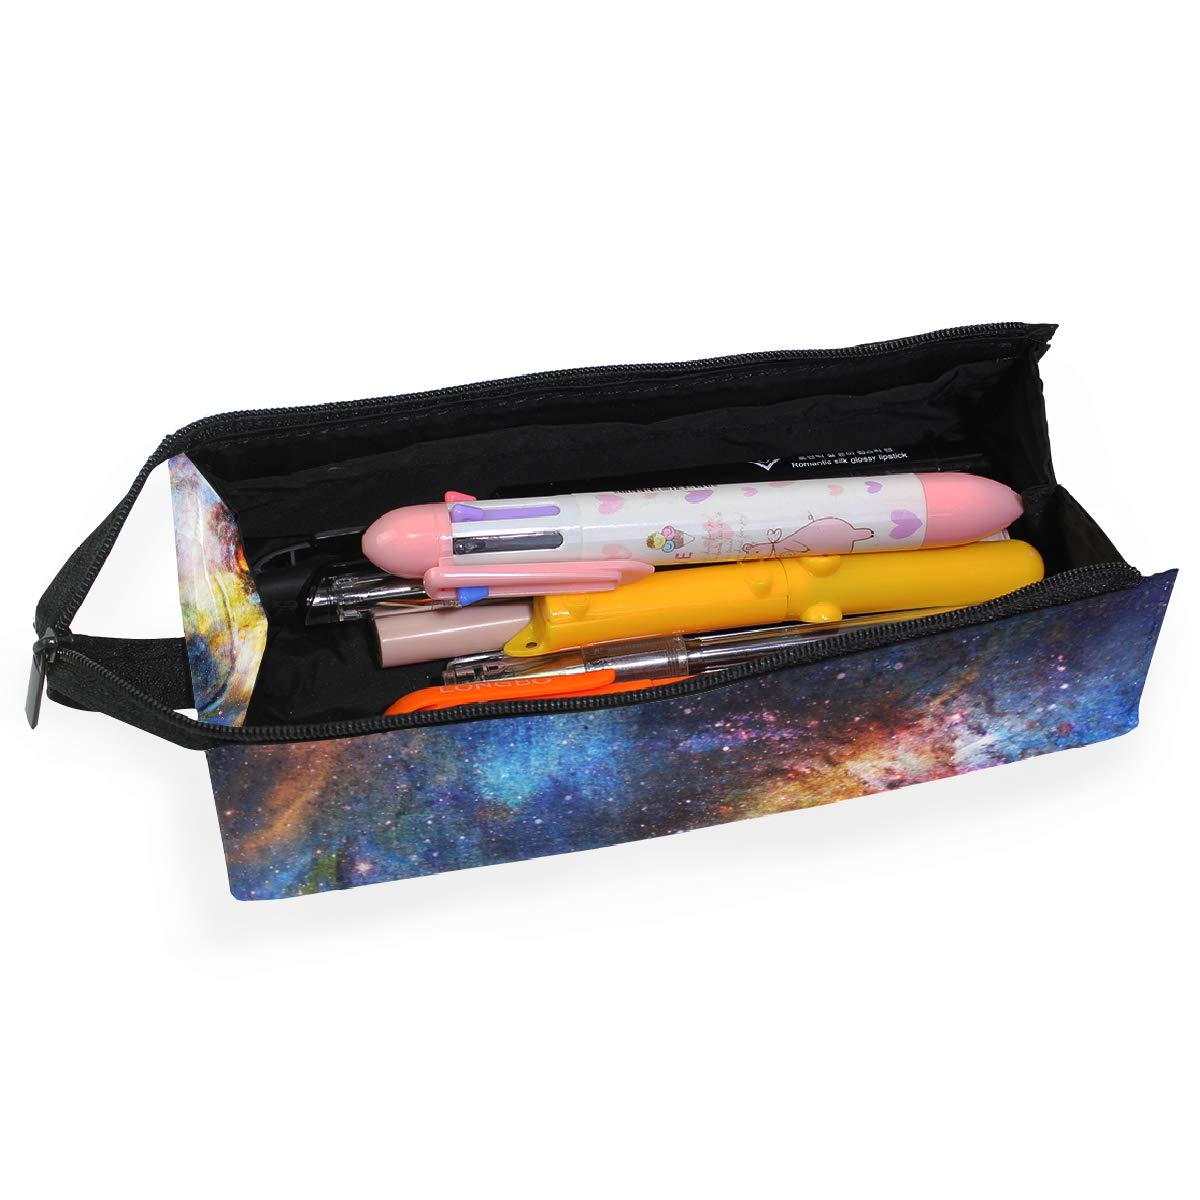 My Little Nest Eyeglass Sunglasses Holder Pouch Bag Magical Space Multi Function Zipper Pen Case Pencil Bag Organizer